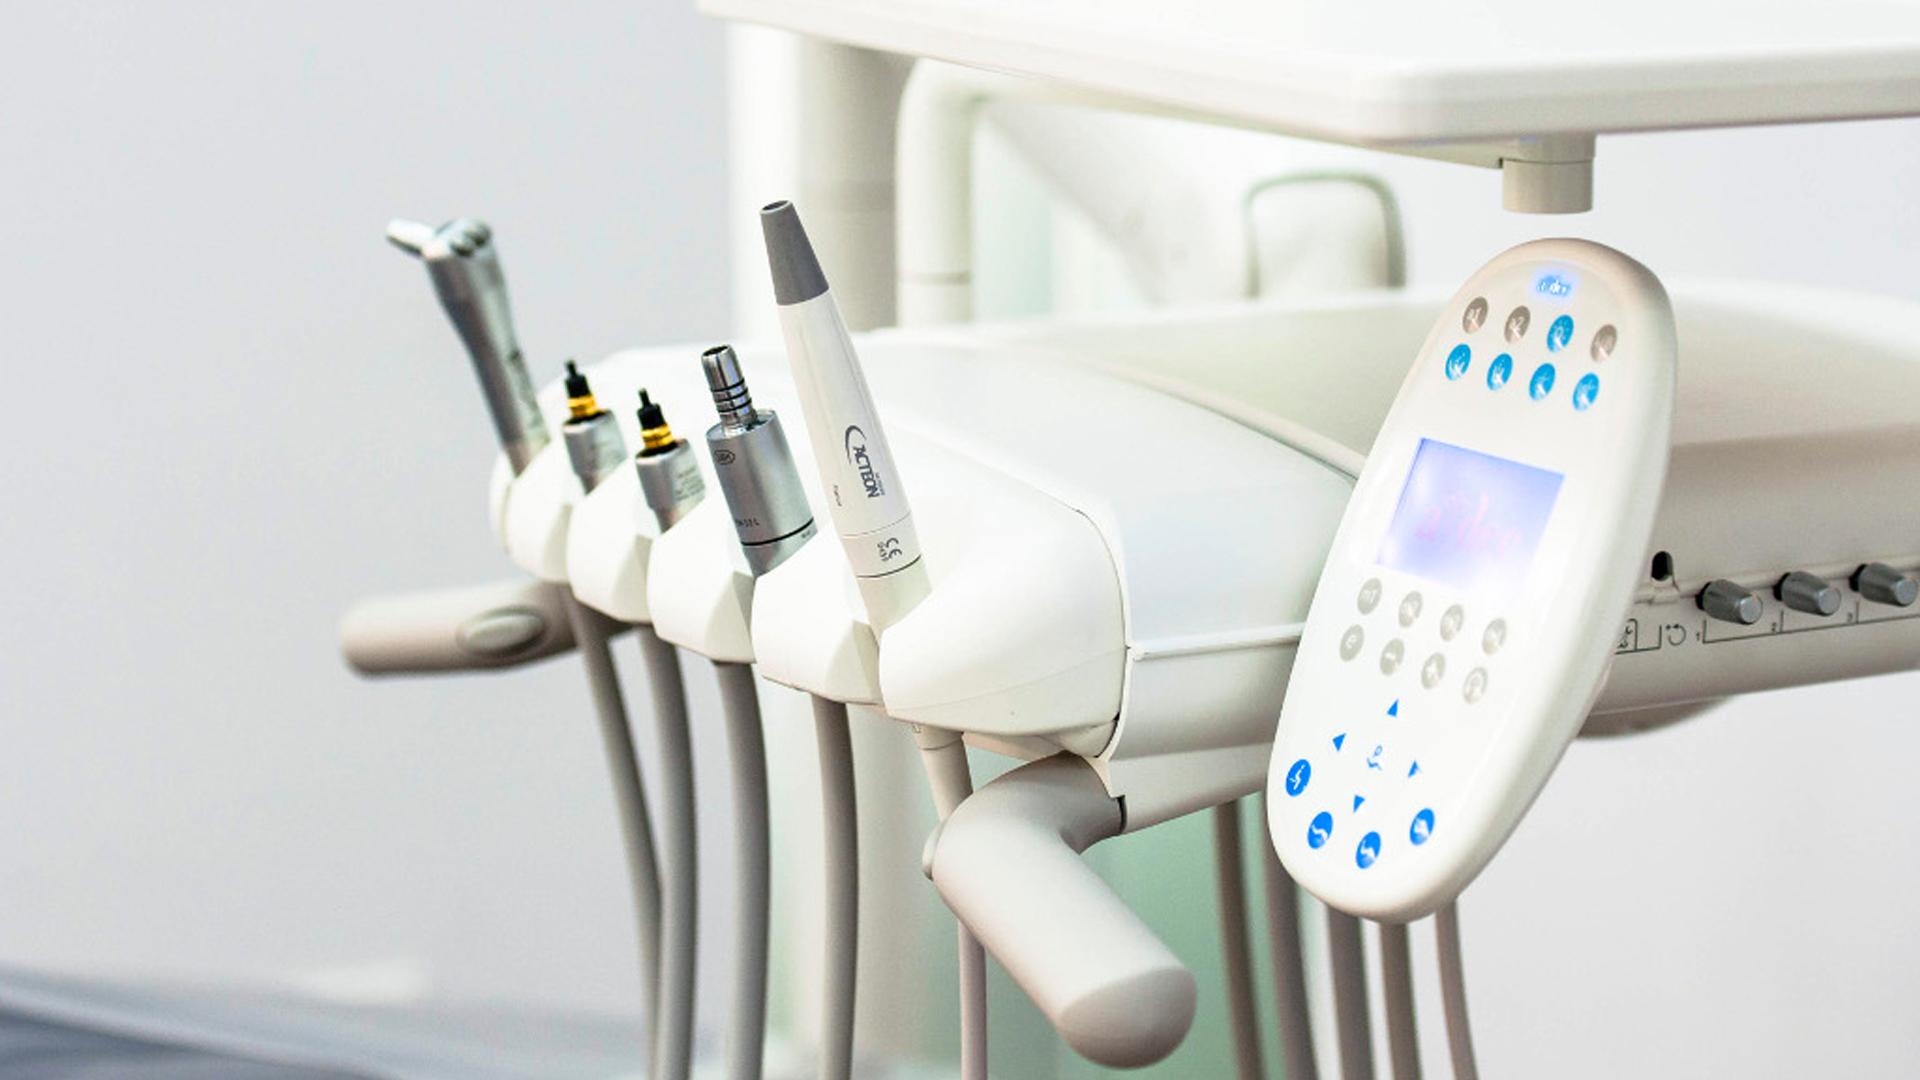 TEETH Tiong Bahru neighborhood dental clinic equipment 1